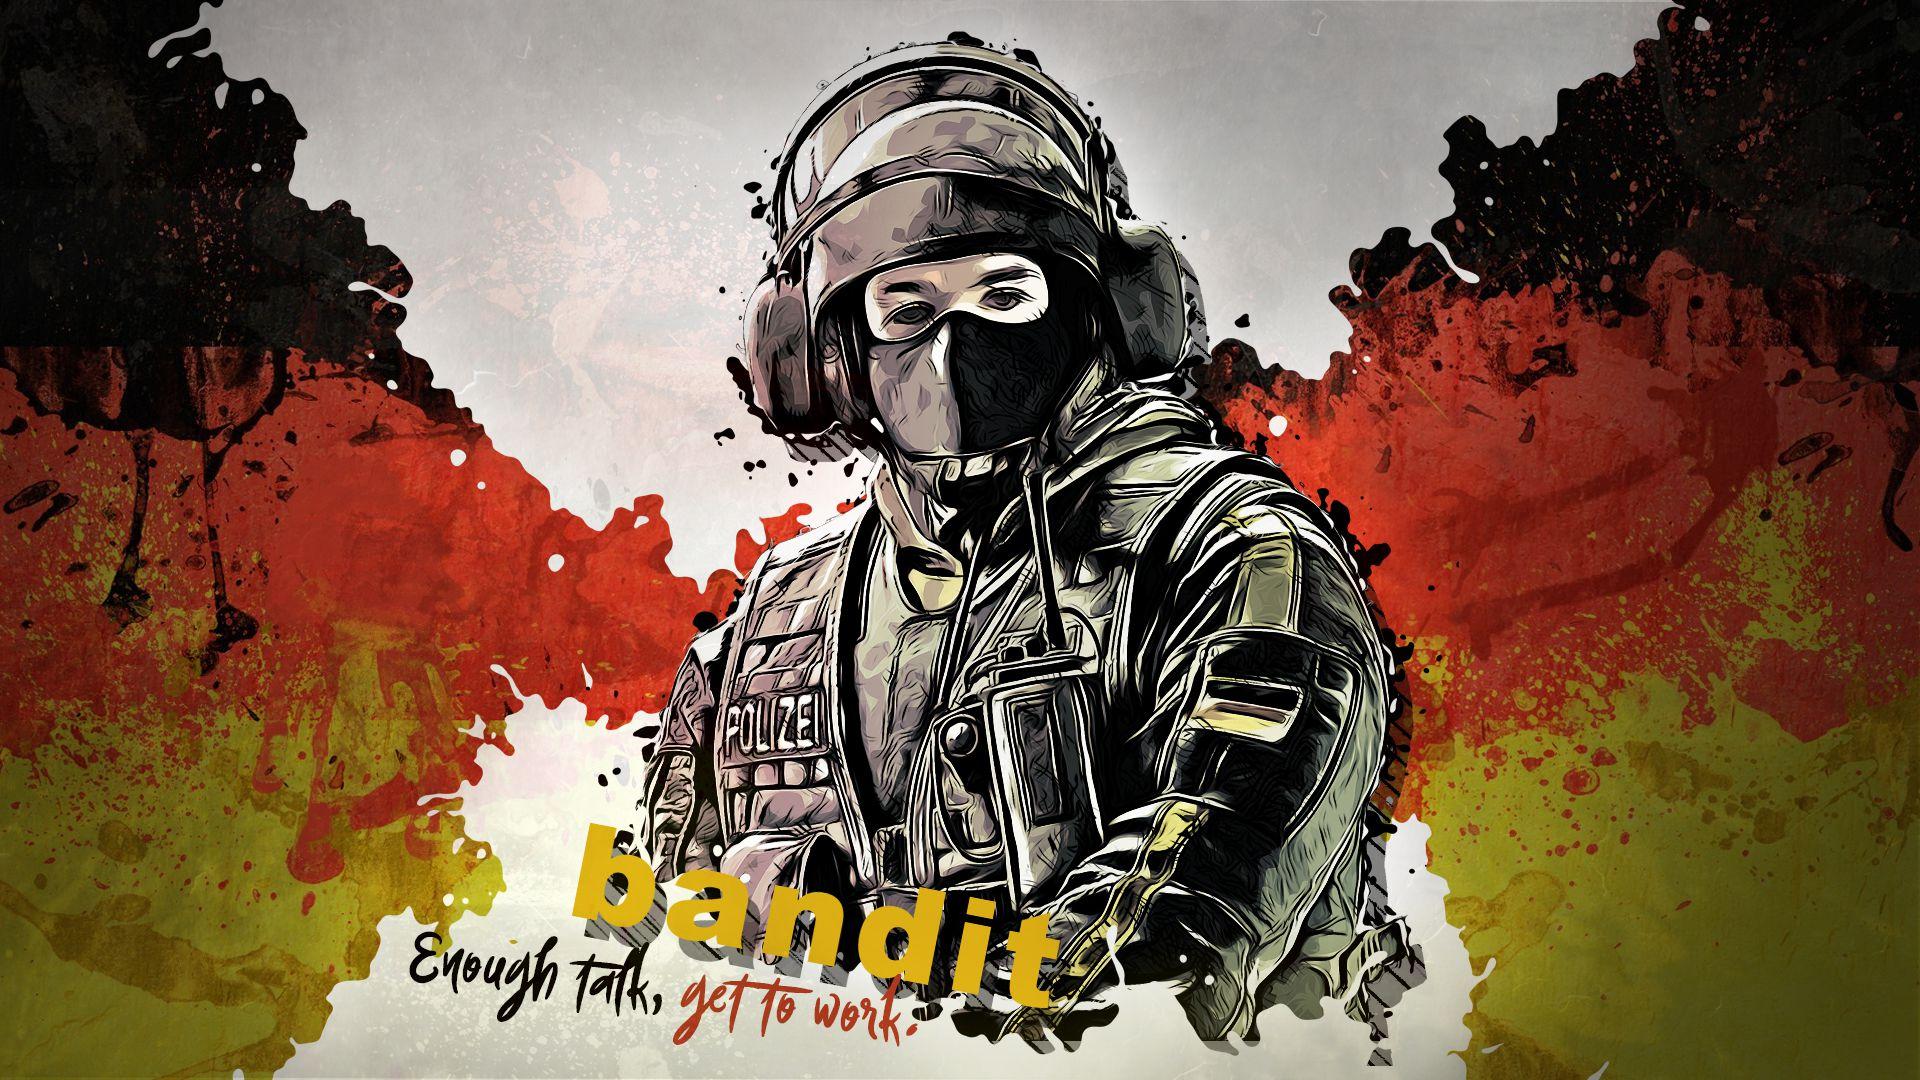 Rainbow Six Siege Patriot Wallpaper: Rainbow Six Siege Operator Wallpapers : Rainbow6